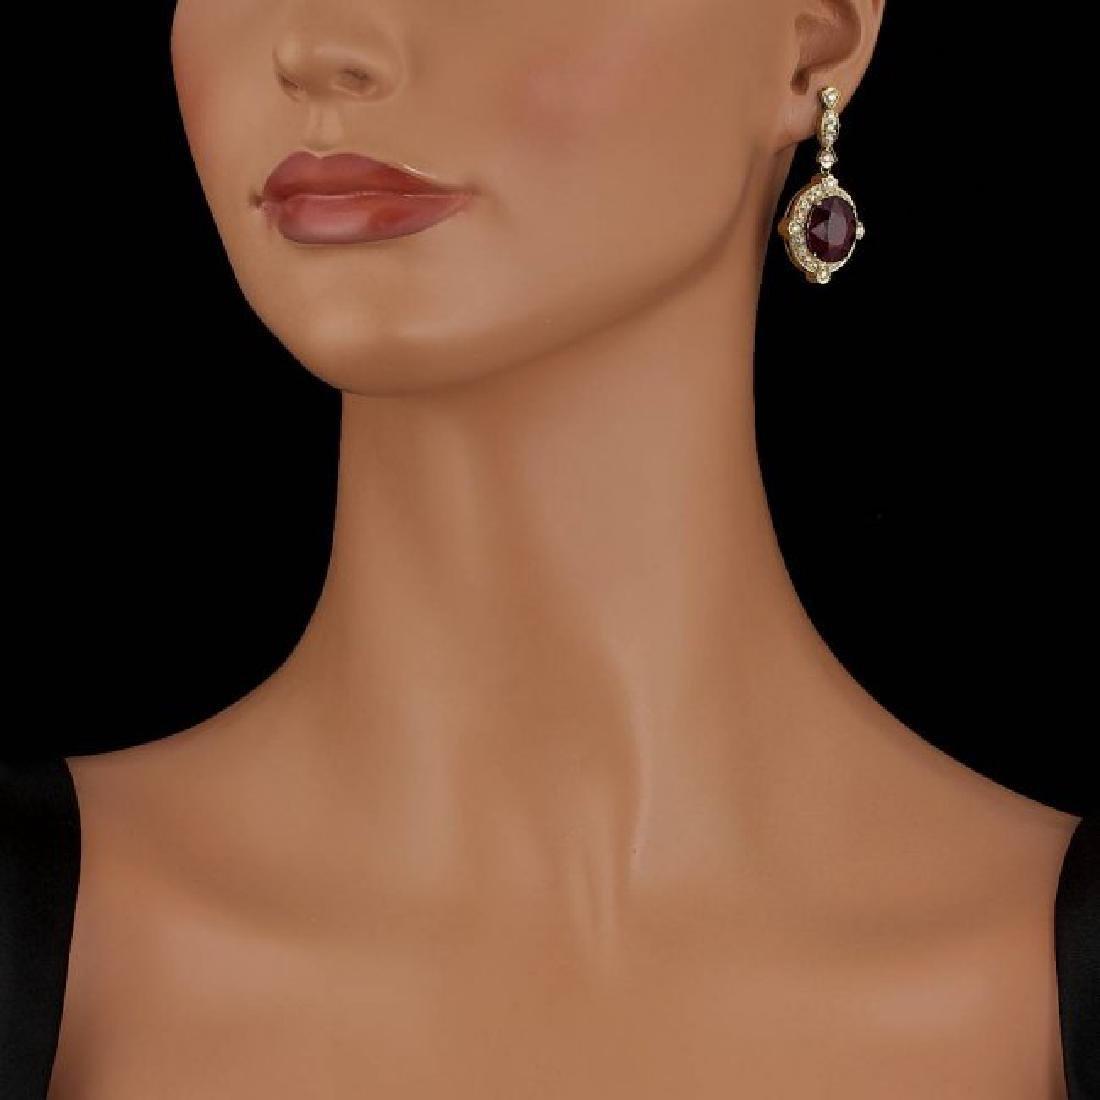 14k Gold 22.50ct Ruby 1.70ct Diamond Earrings - 4